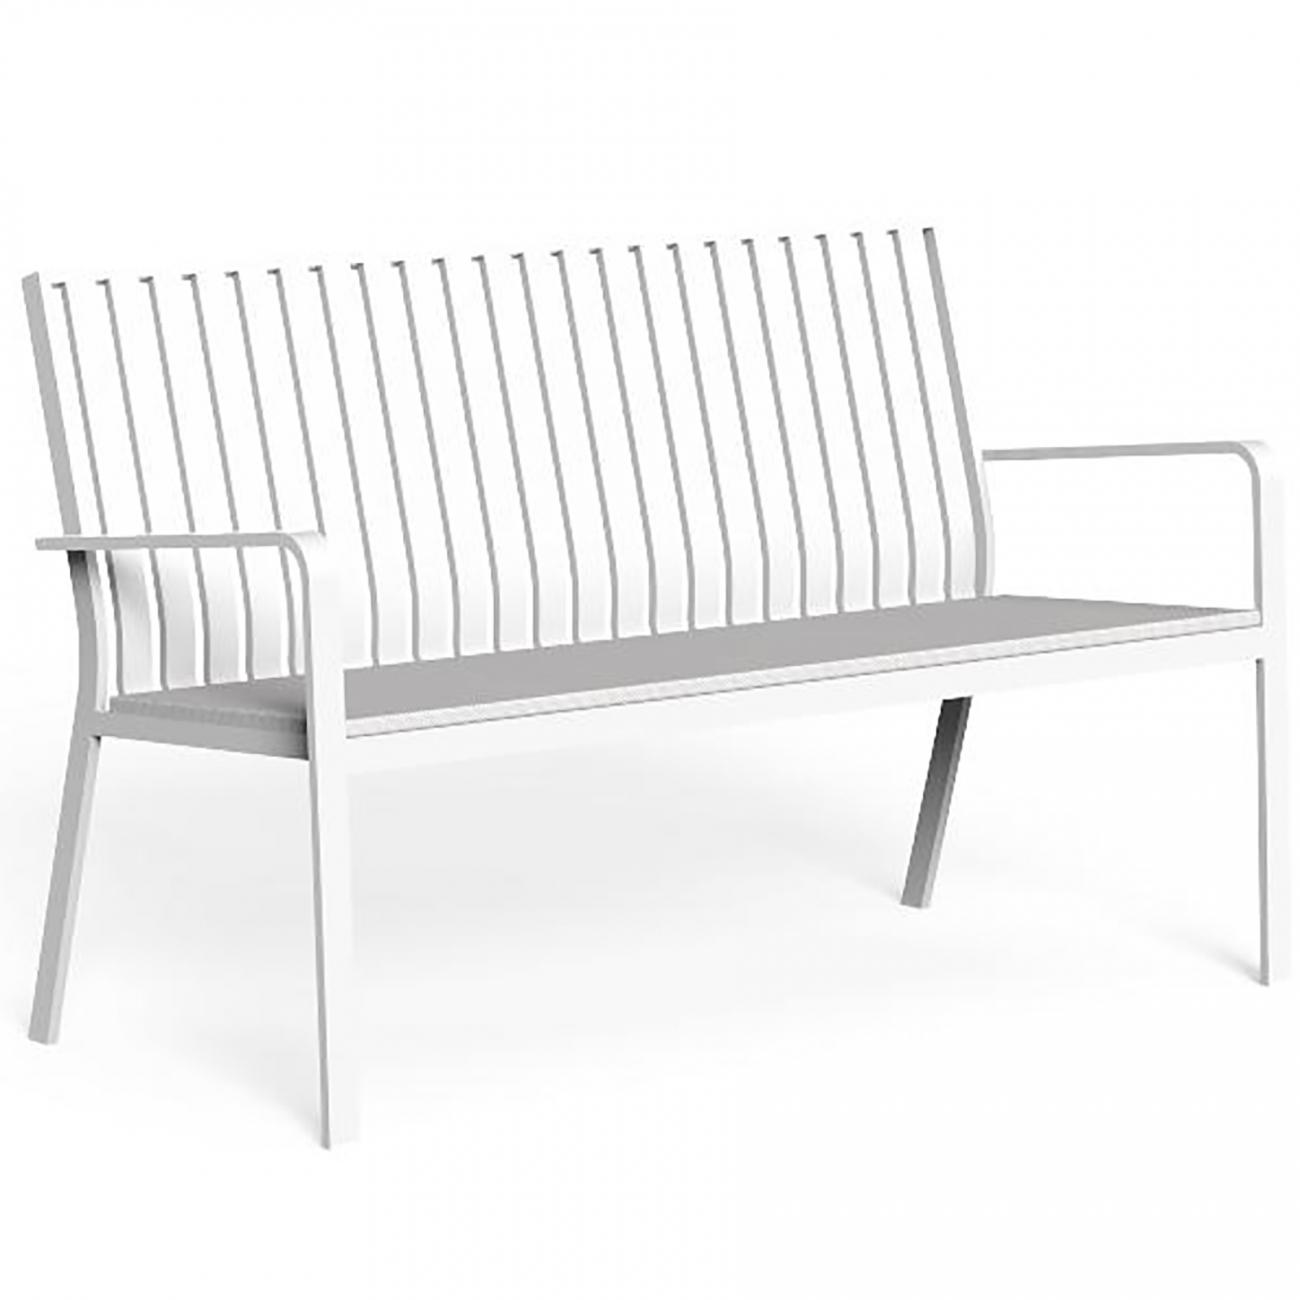 Talenti Lady bench